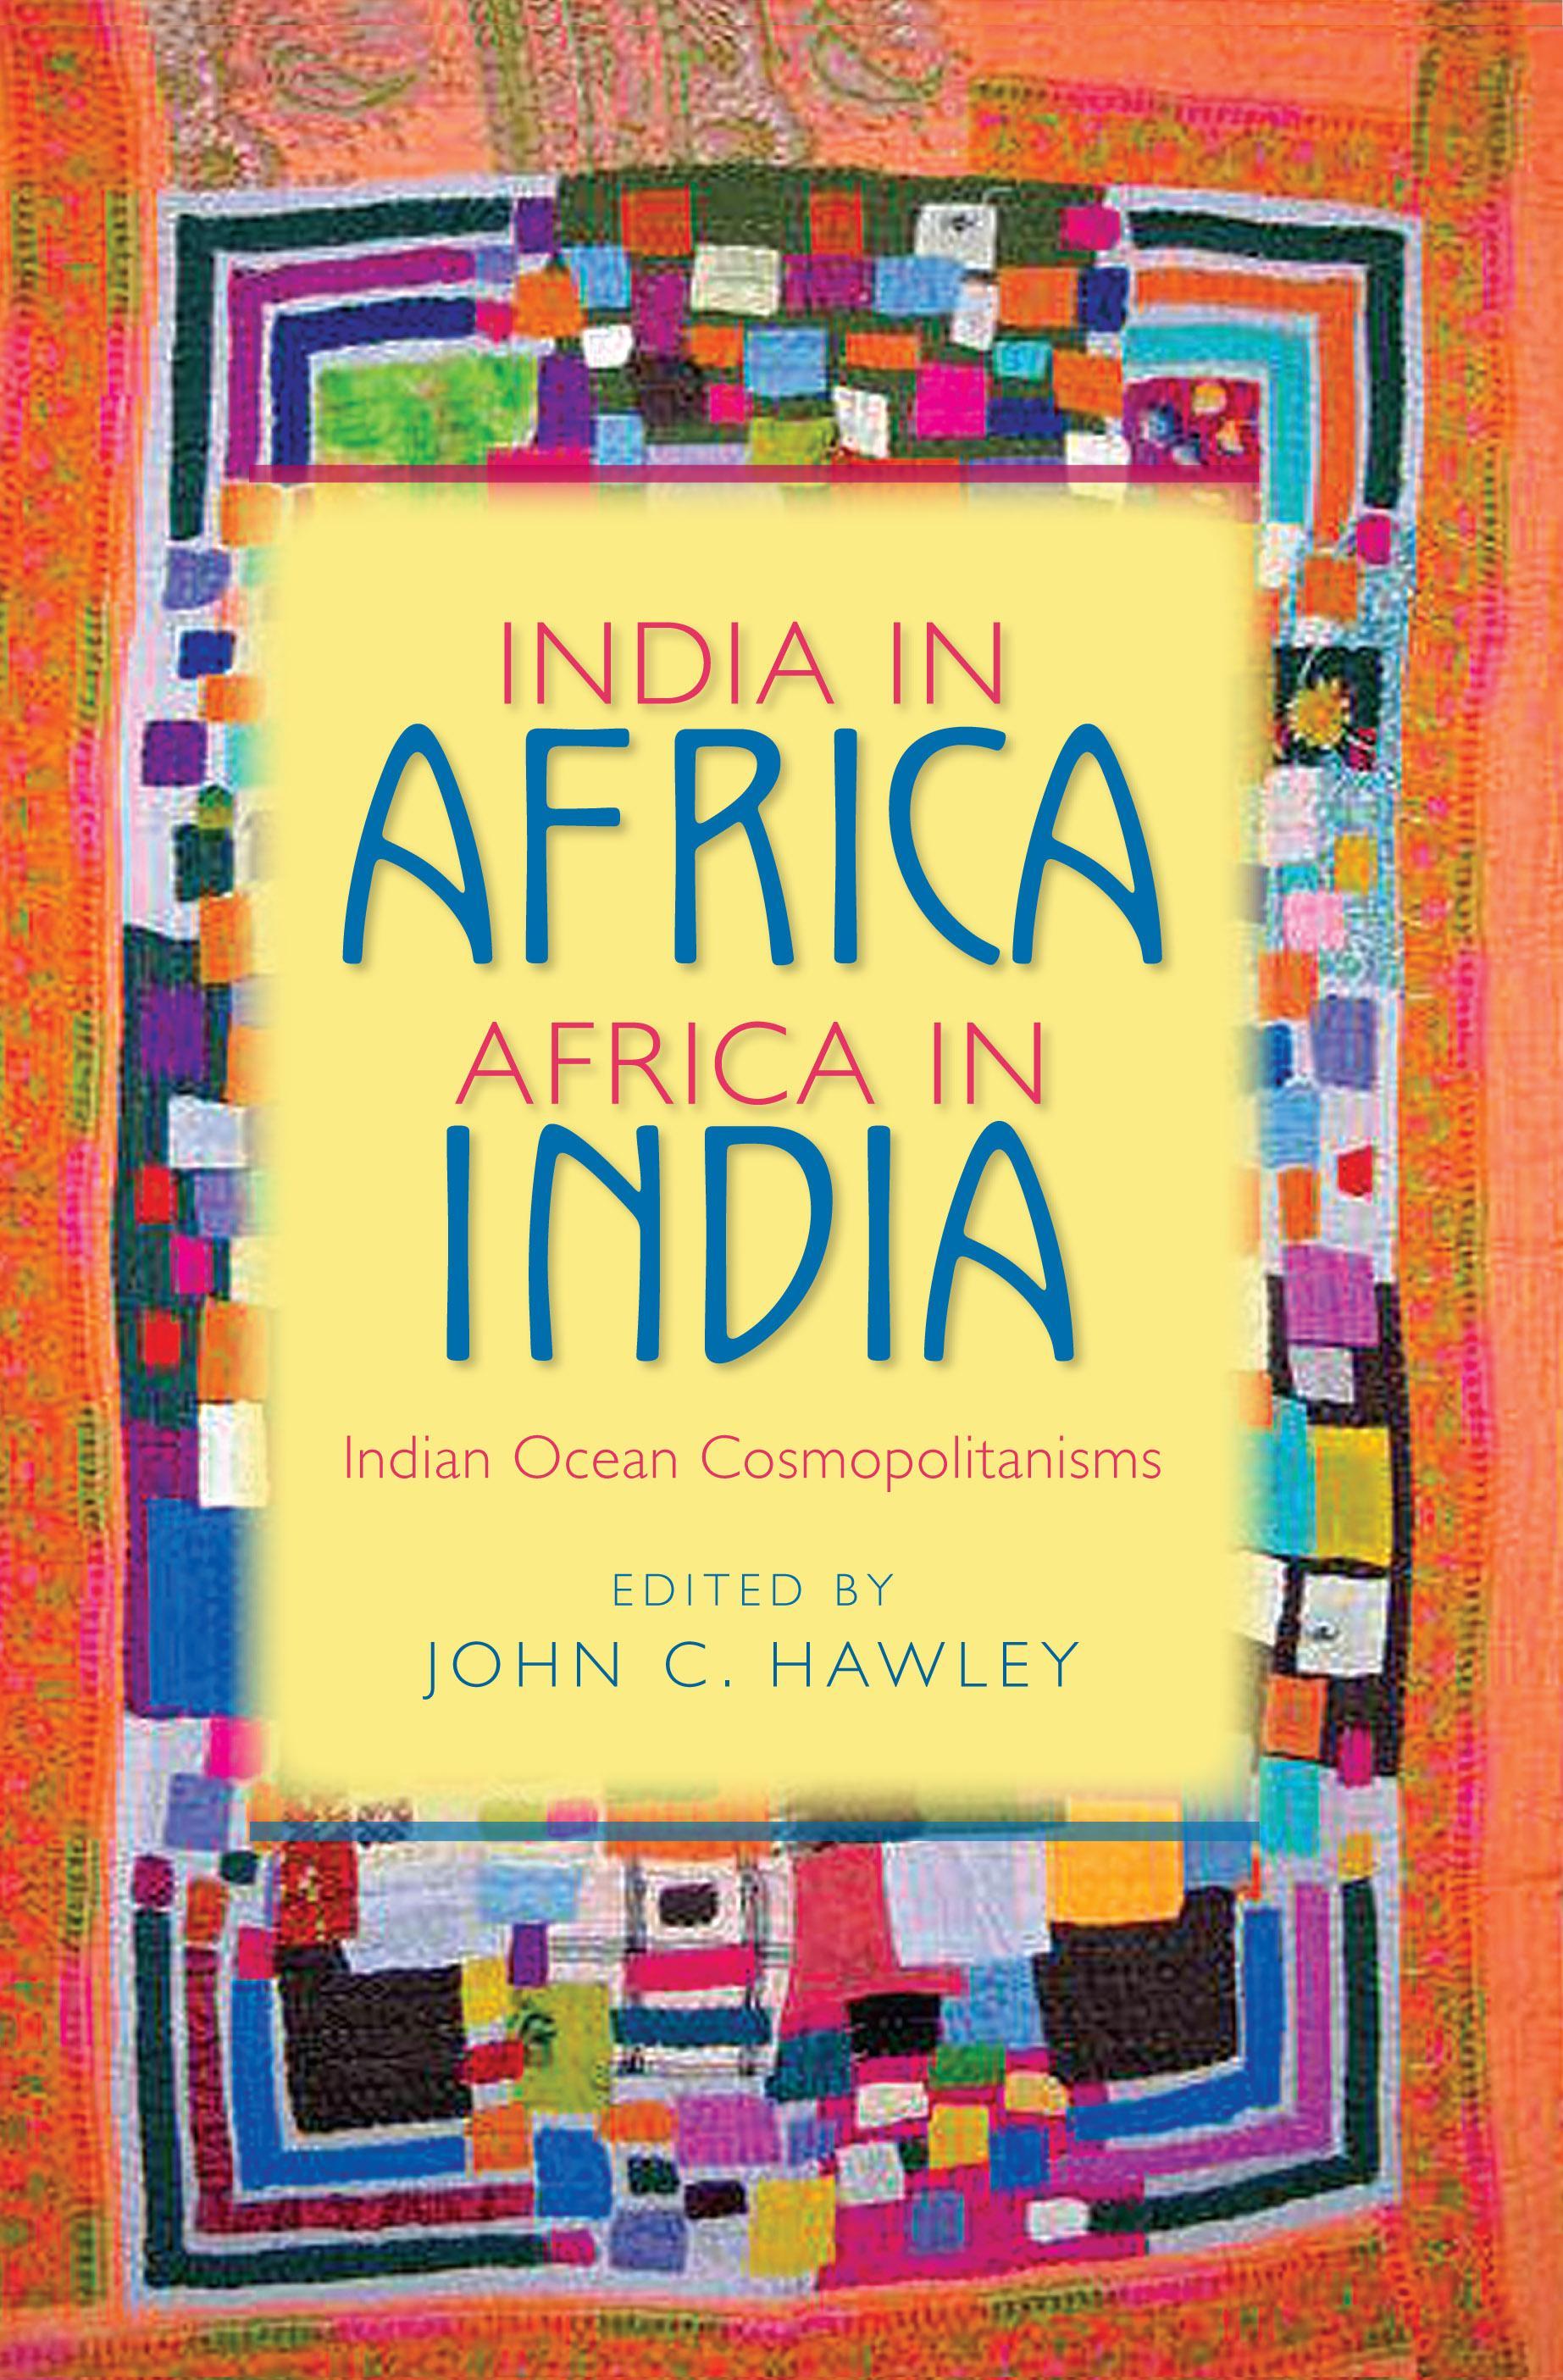 India in Africa, Africa in India: Indian Ocean Cosmopolitamisms